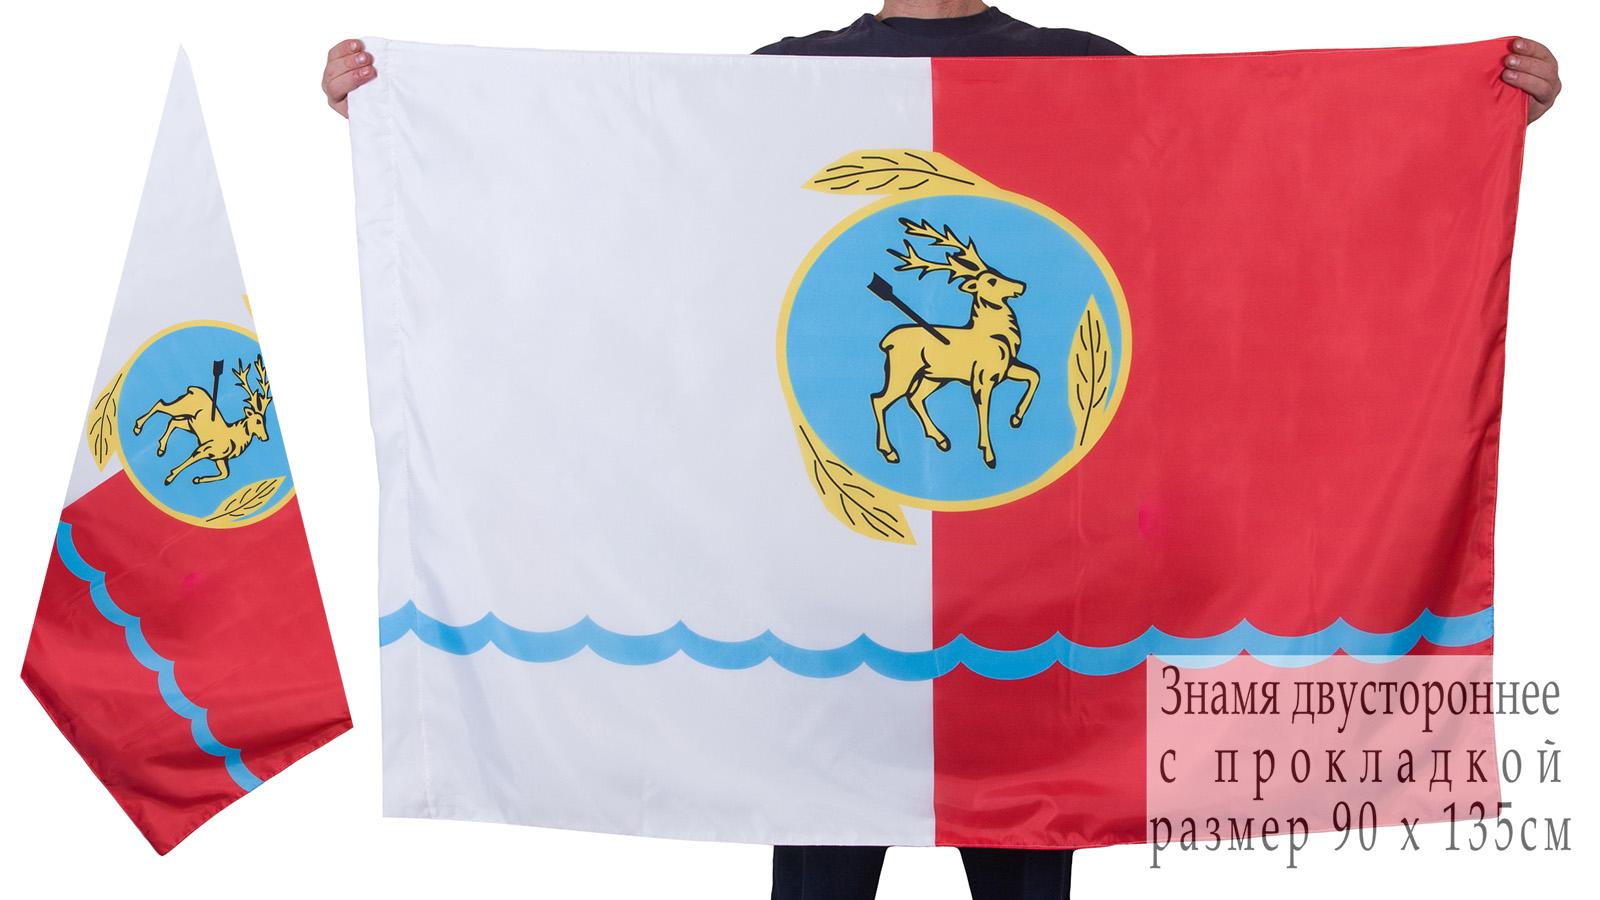 Двухсторонний флаг Каменска-Шахтинского